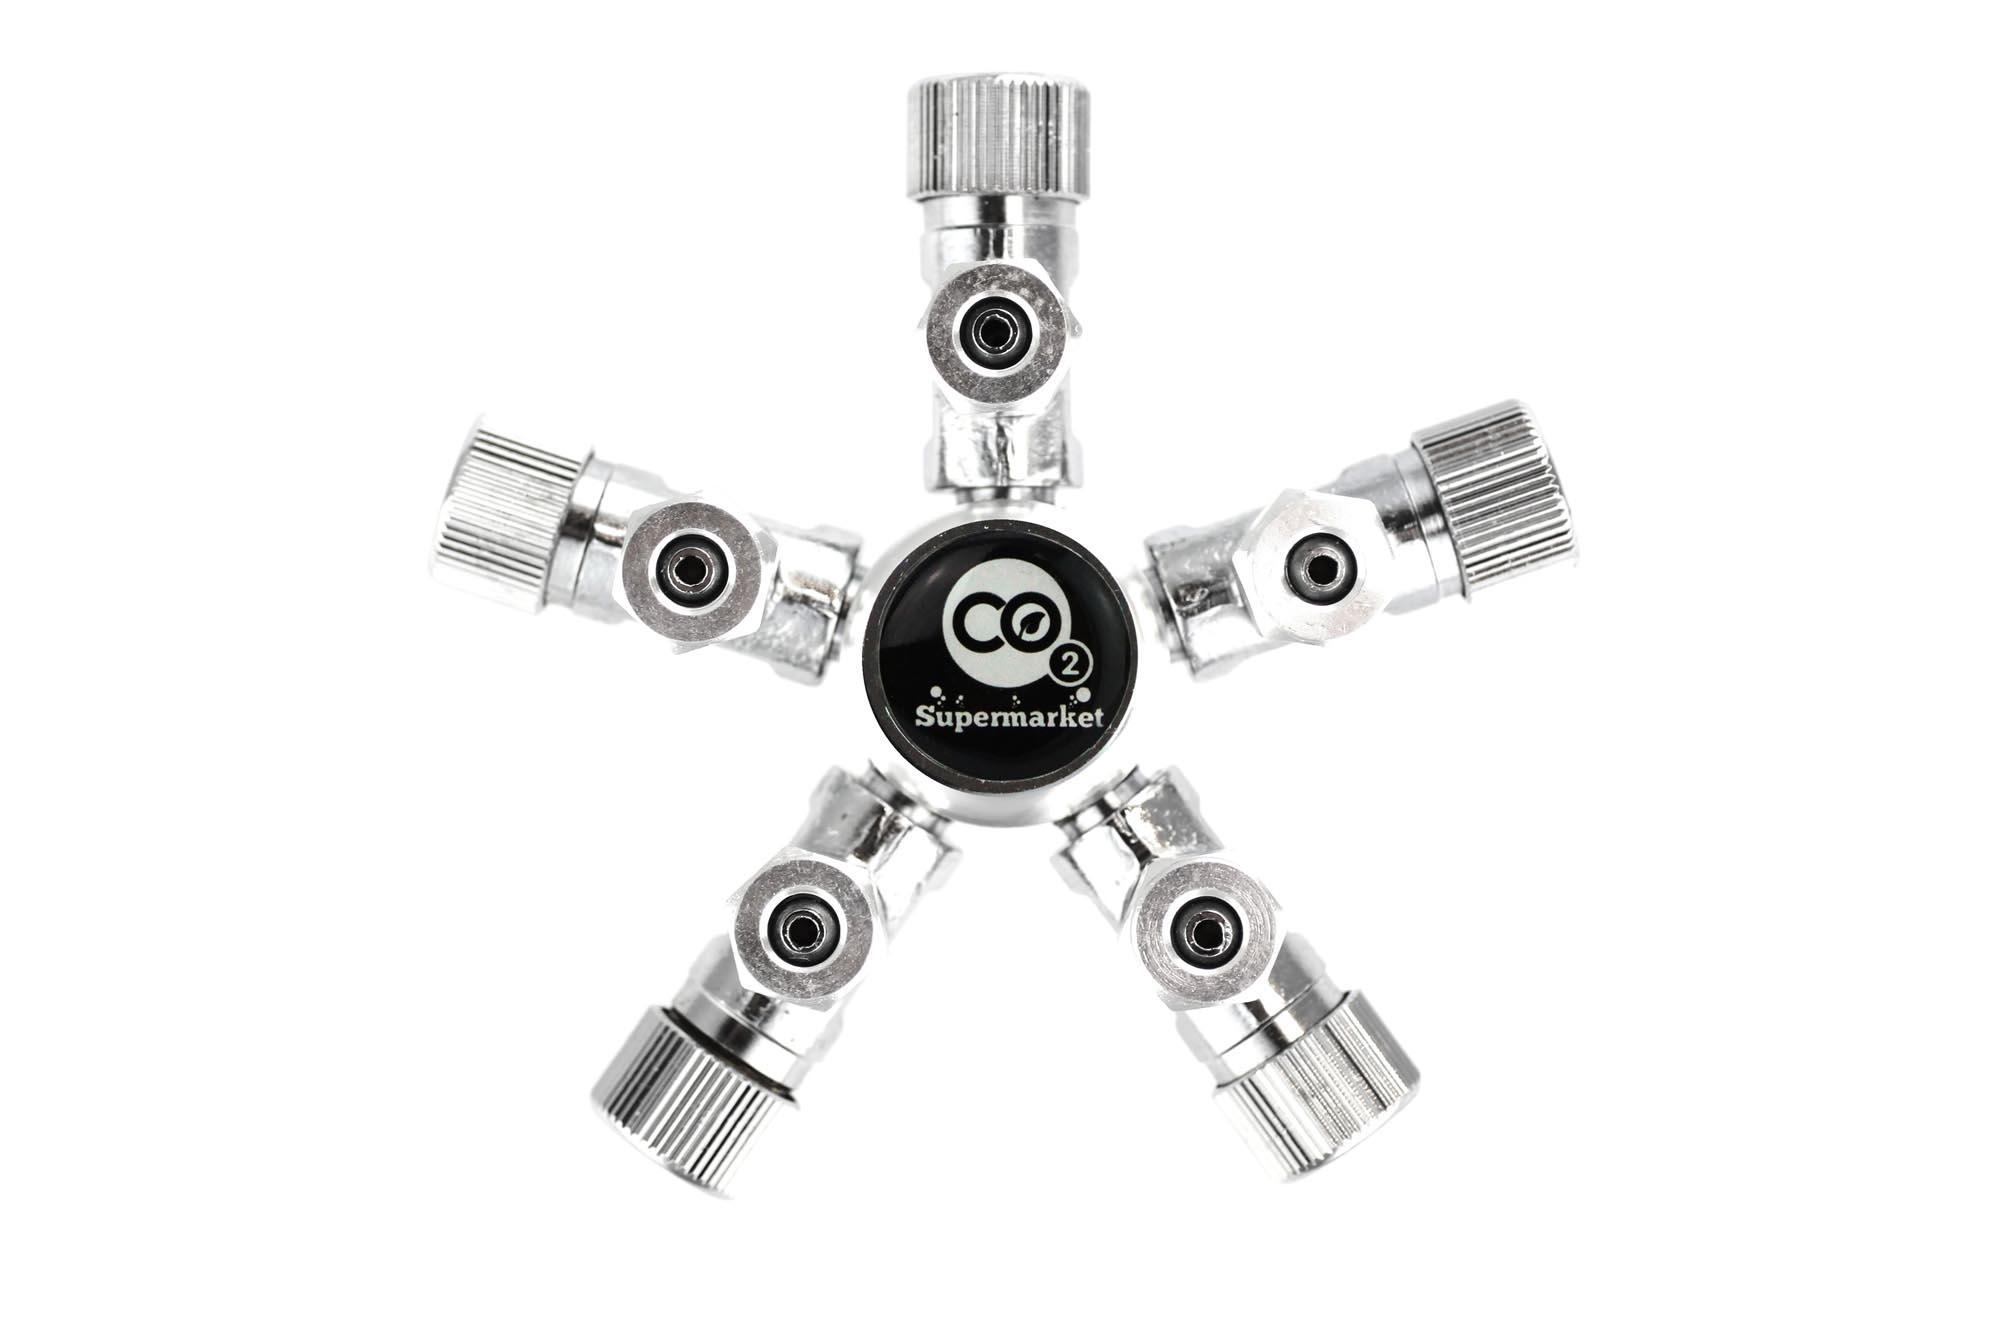 5 Way Splitter For Co2 Solenoid Regulator P121 moreover Mazd11fr moreover P 1306 Vivminispinoutflow13mm together with Aquarium Carbon Dioxide likewise 271096567187. on co2 tank splitter